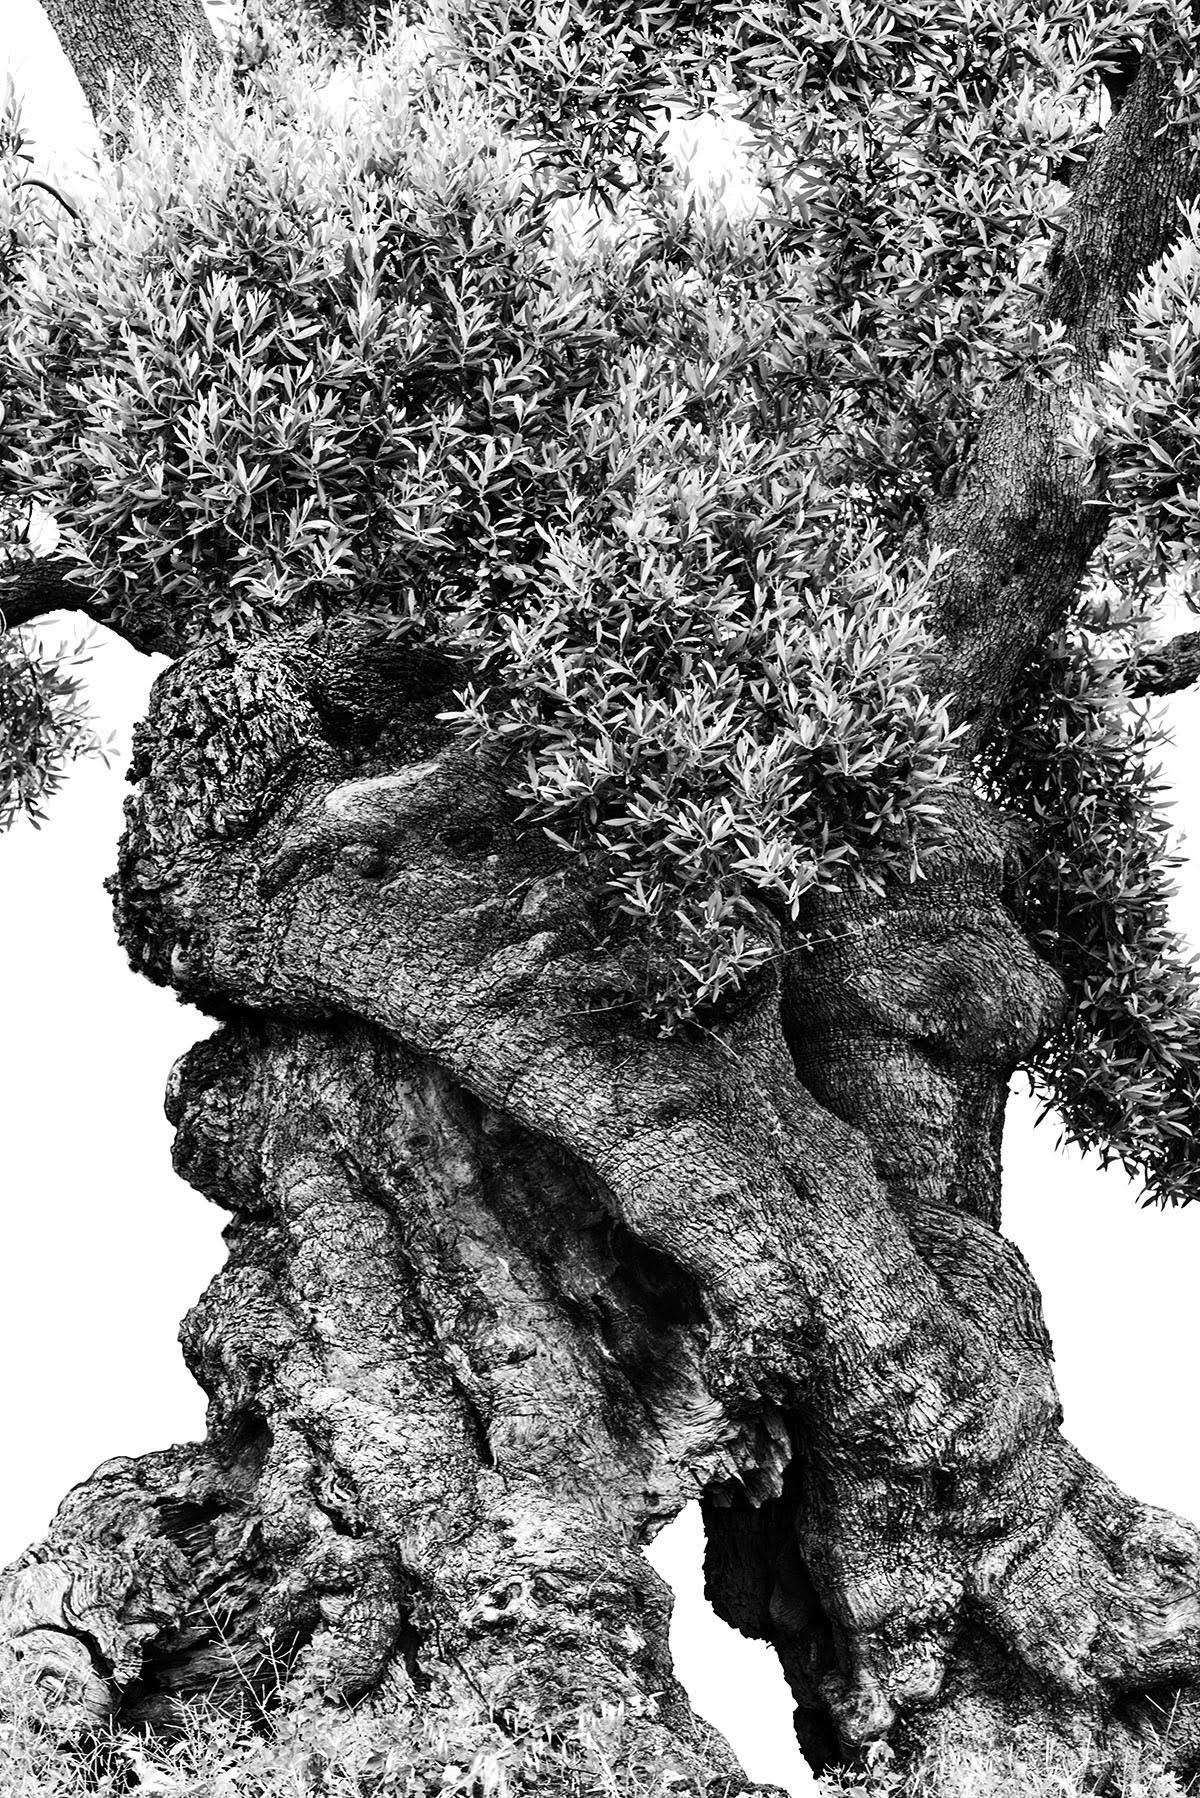 martin-ogolter-Monumentali-nature-landscape-photographer-13